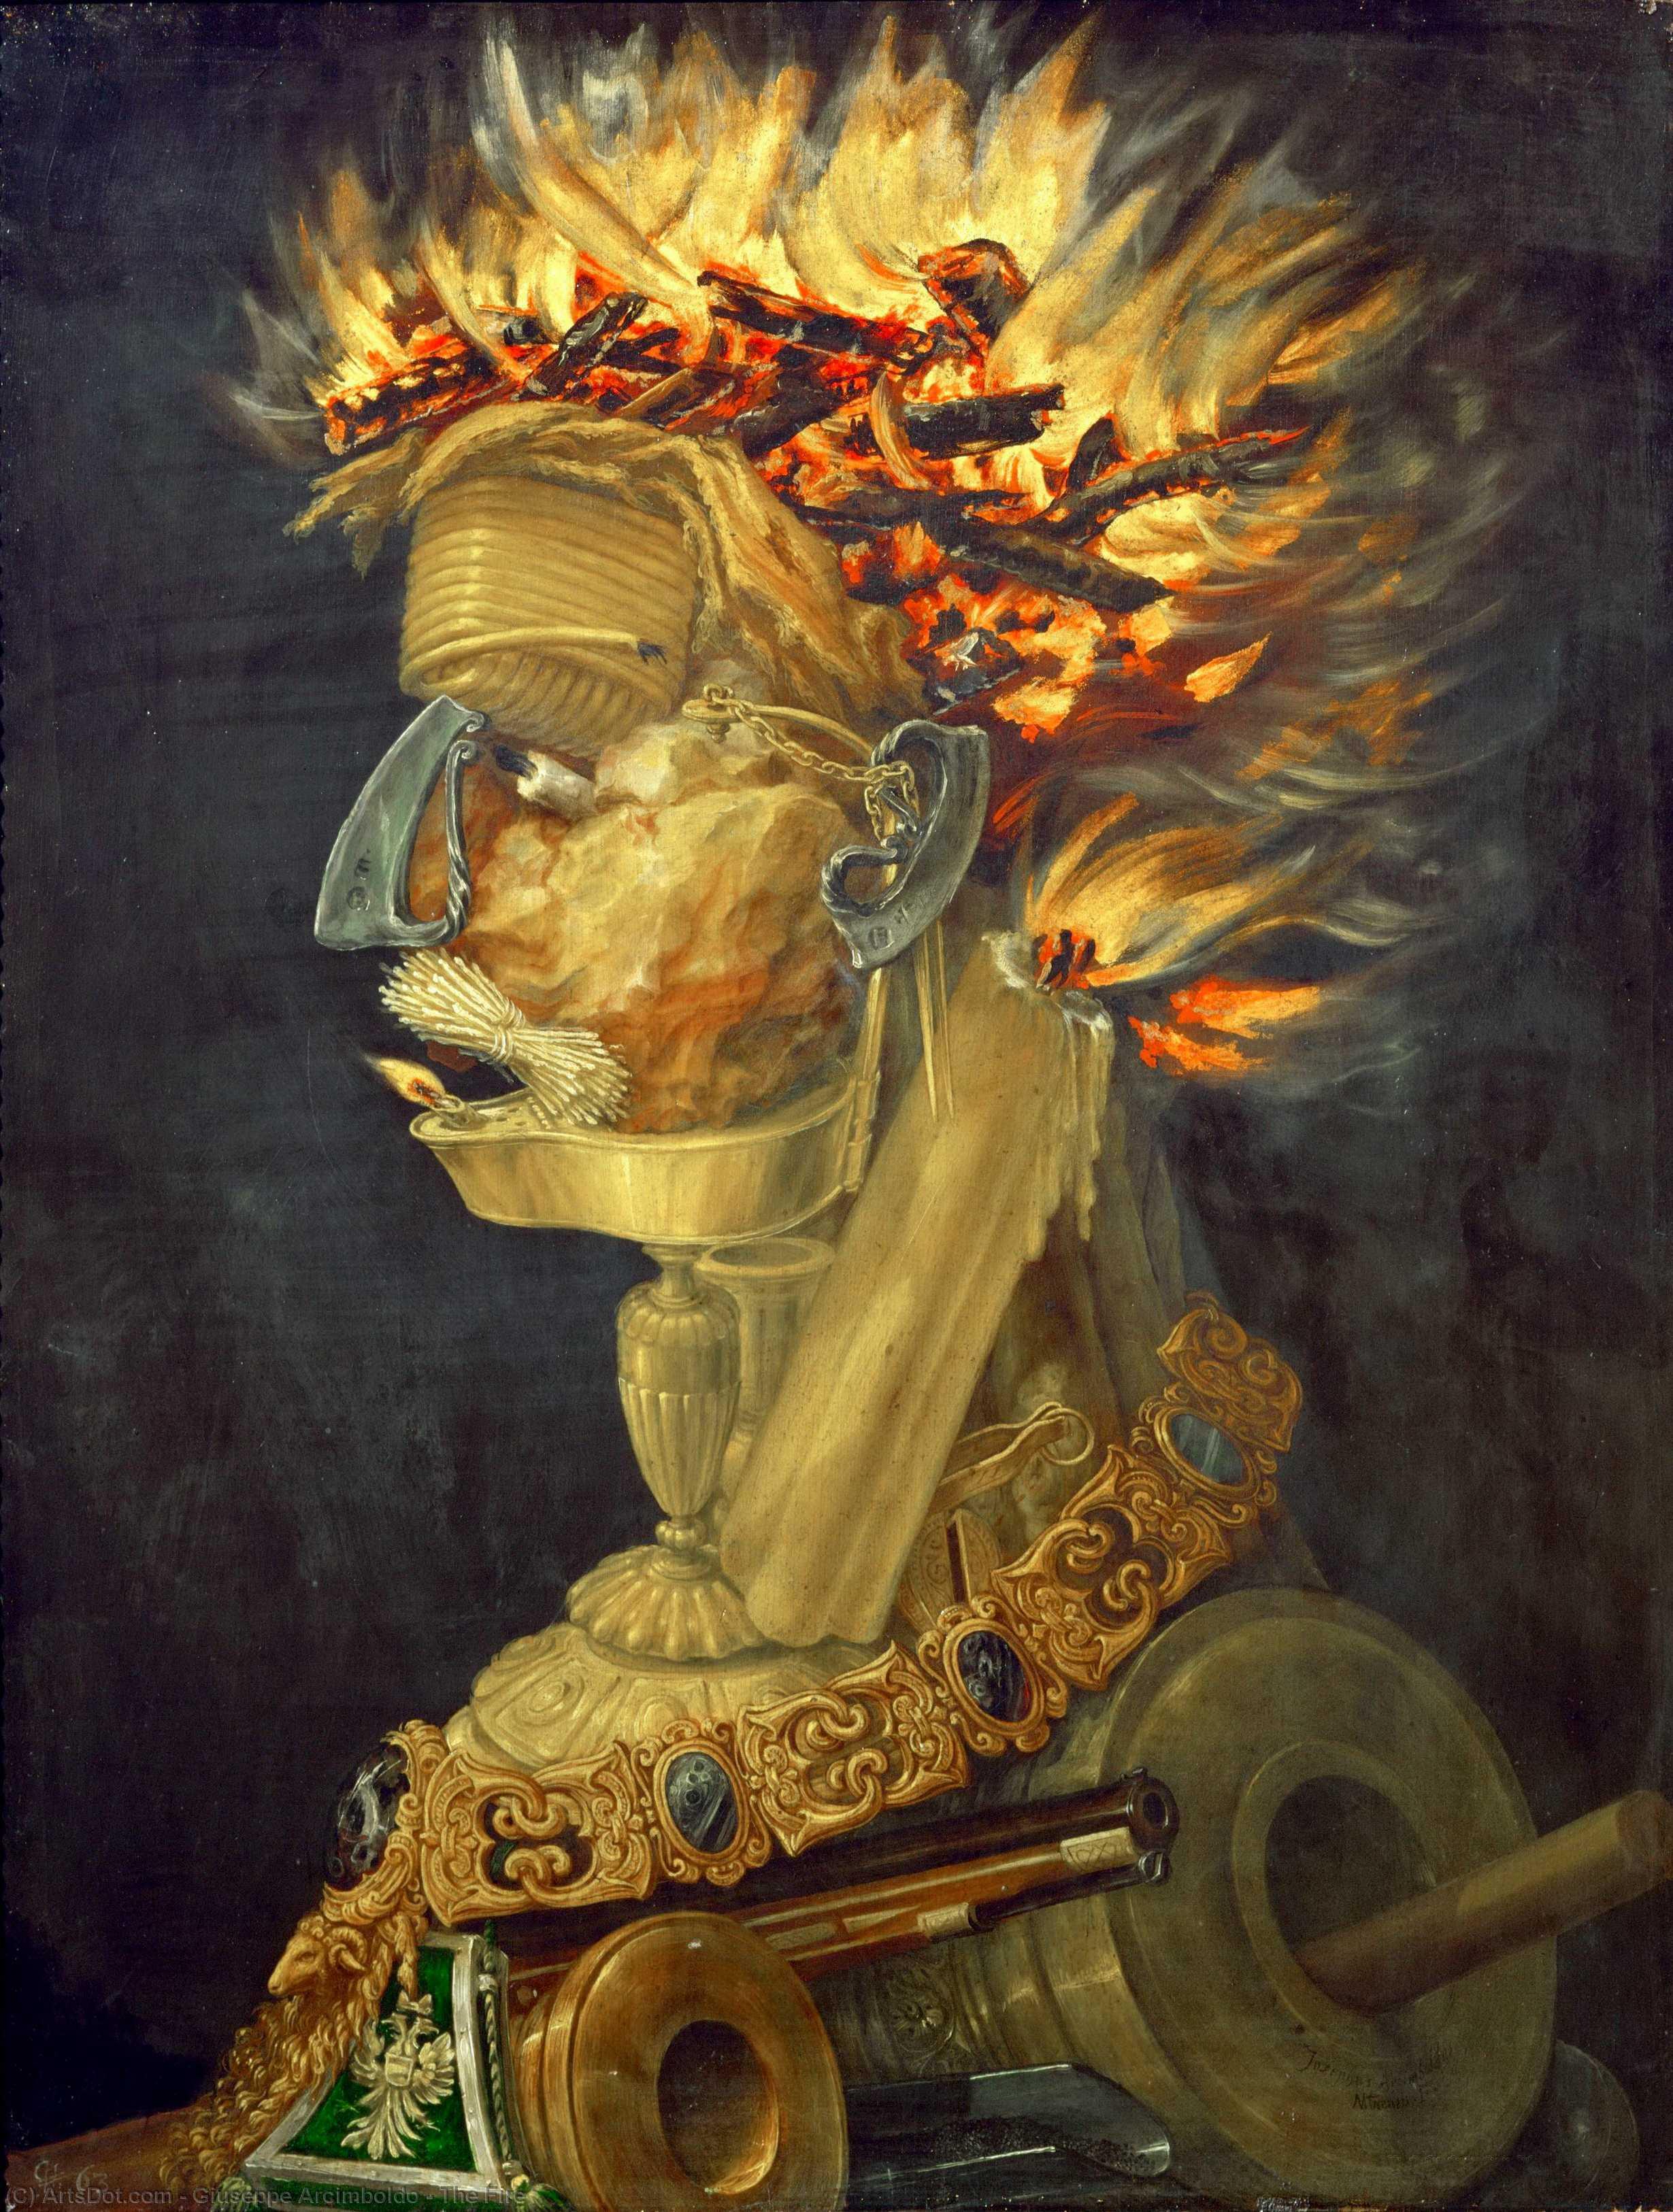 WikiOO.org - Encyclopedia of Fine Arts - Malba, Artwork Giuseppe Arcimboldo - The Fire